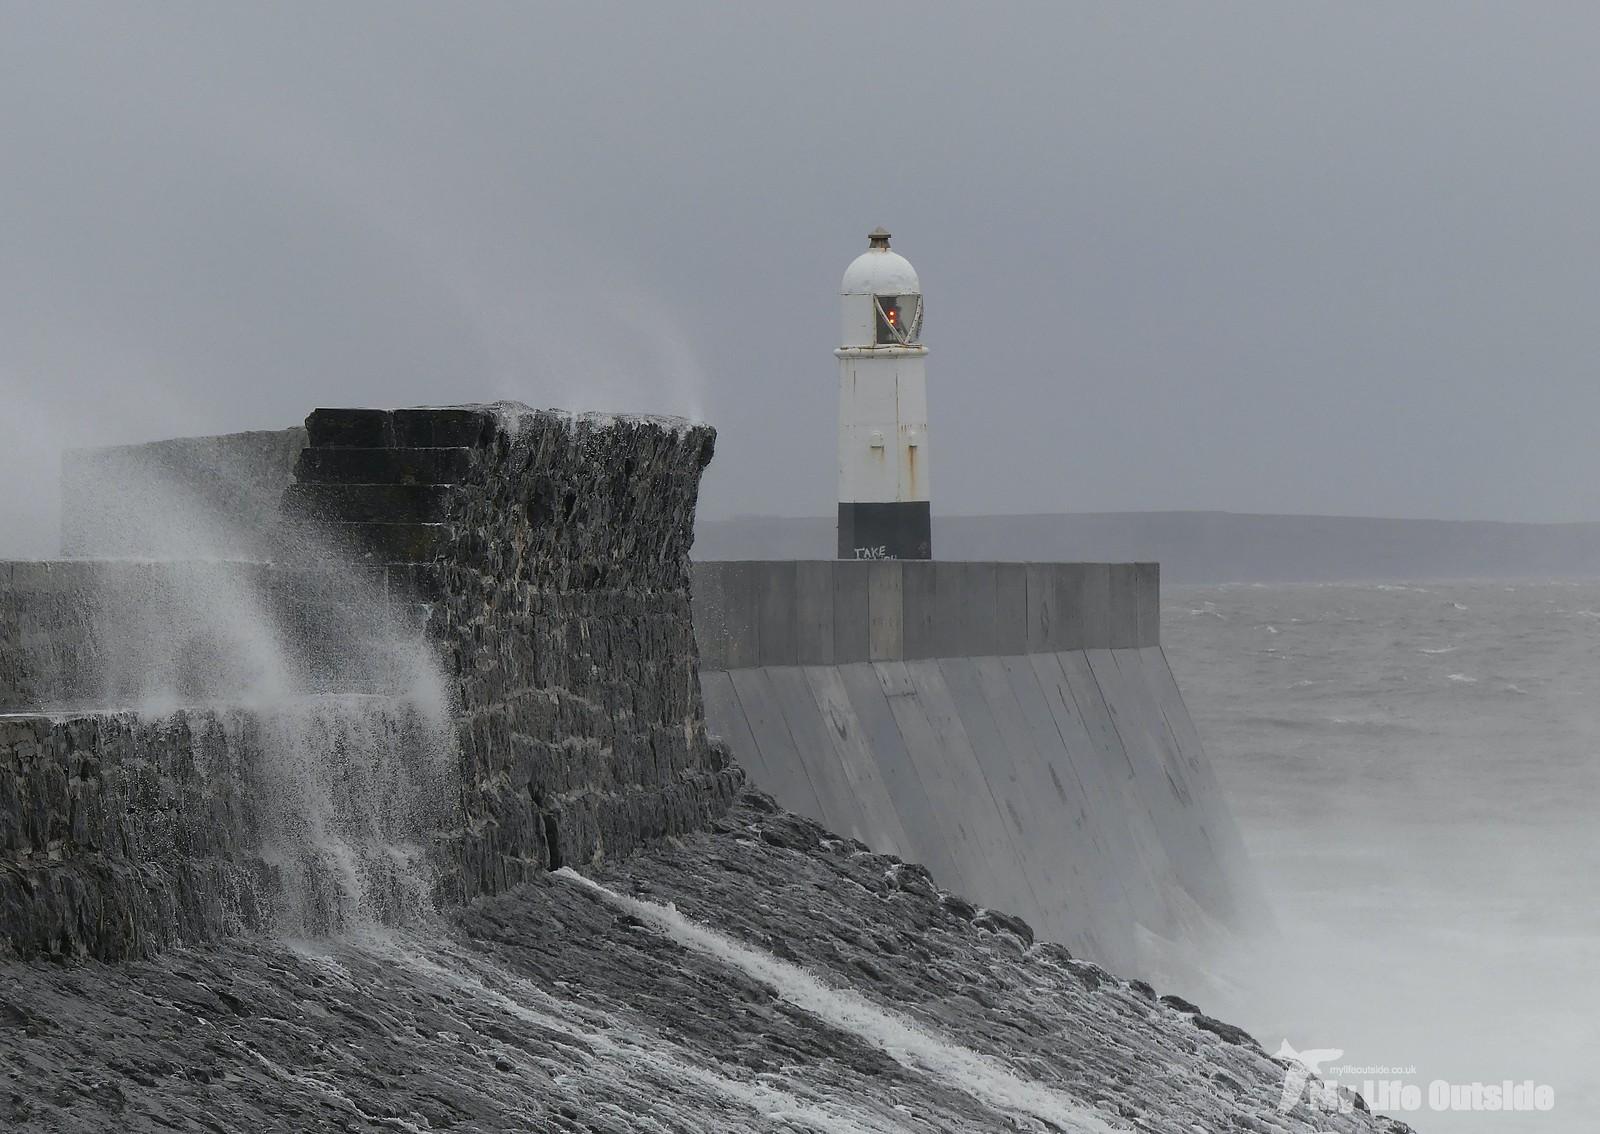 P1230377 - Storm Dennis, Porthcawl